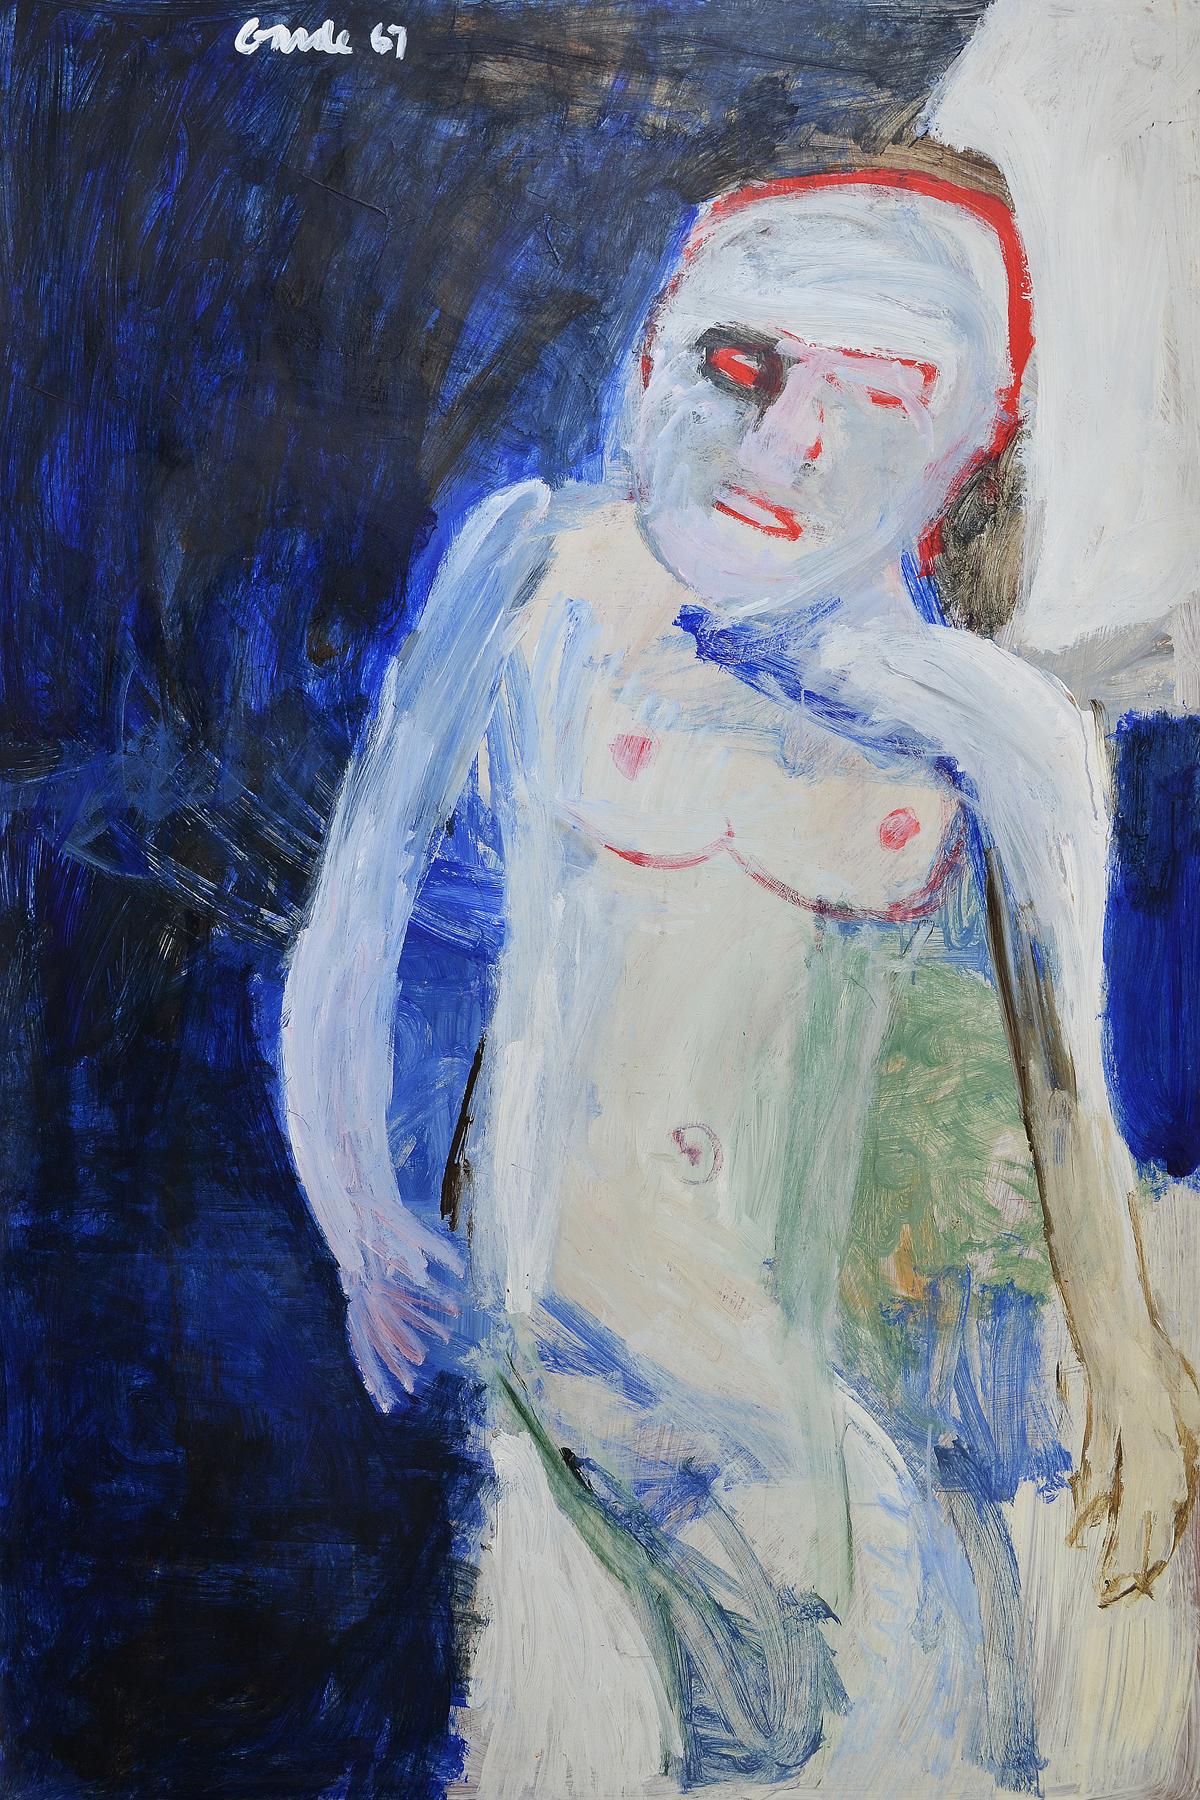 Standing Male (Nude) , 1967. Oil on hardboard (masonite), 72 x 48 in. (183 x 122 cm.)